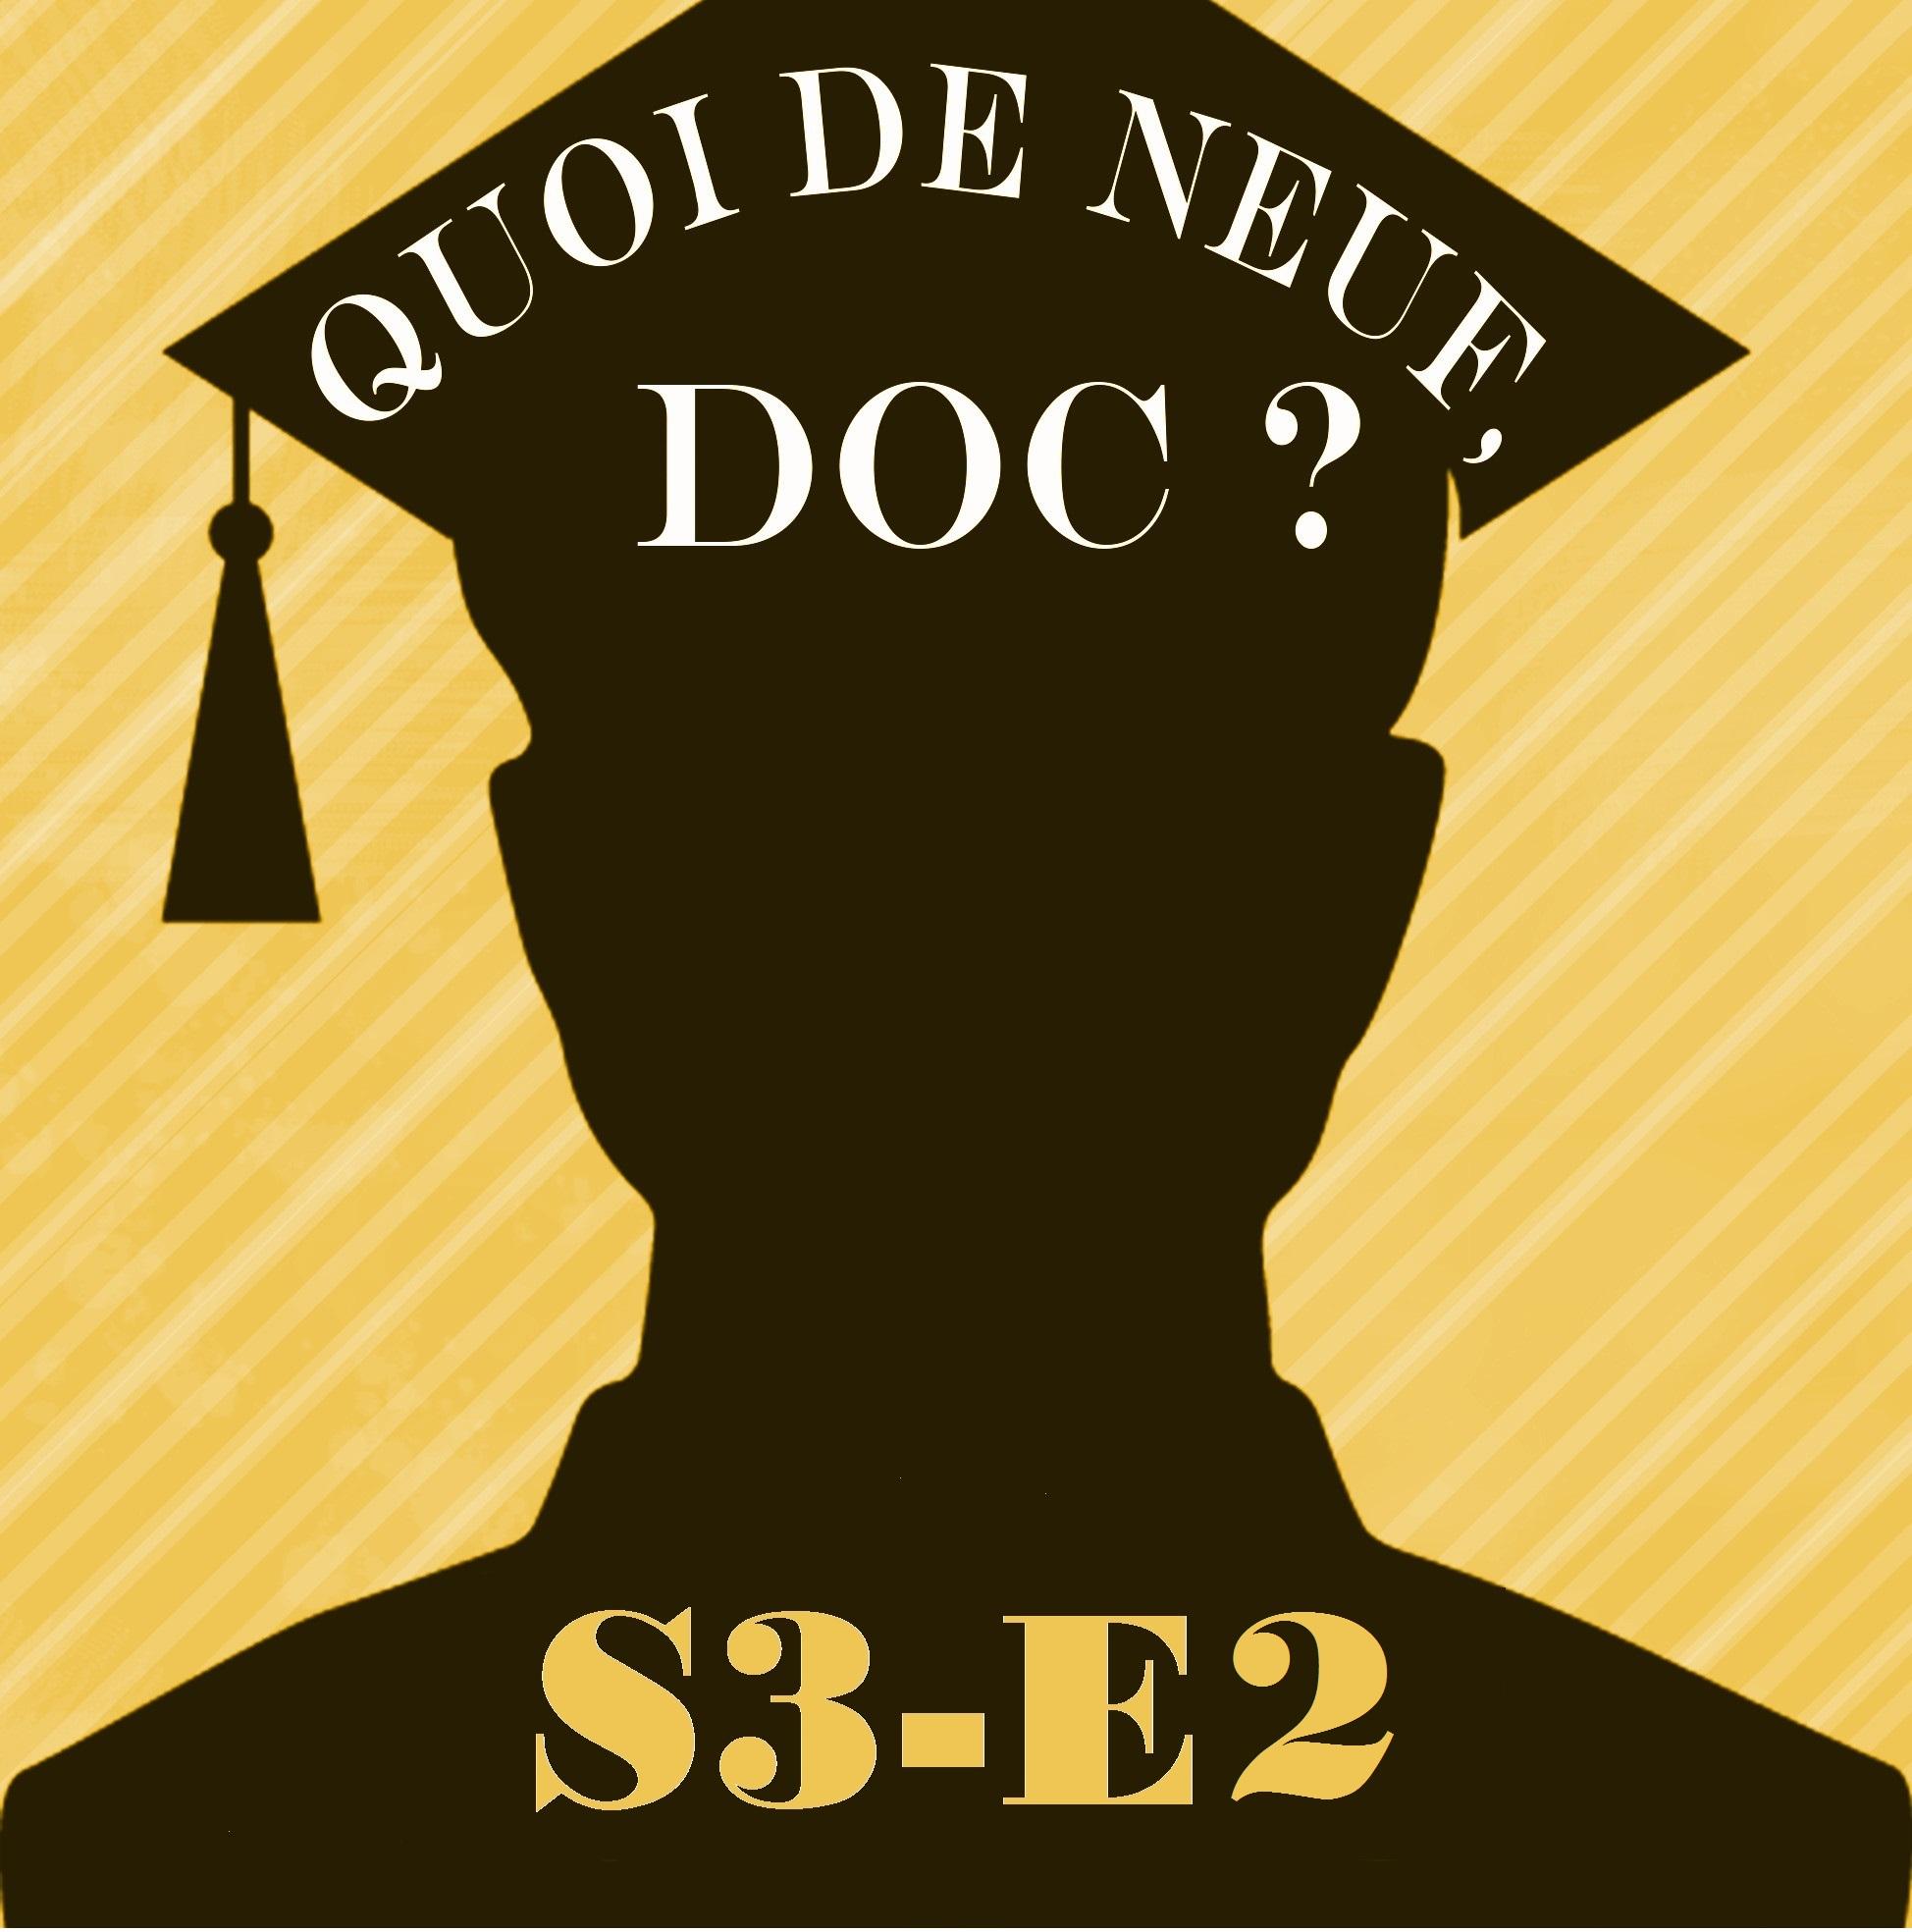 QDND S3E2 Emission du 30 Novembre